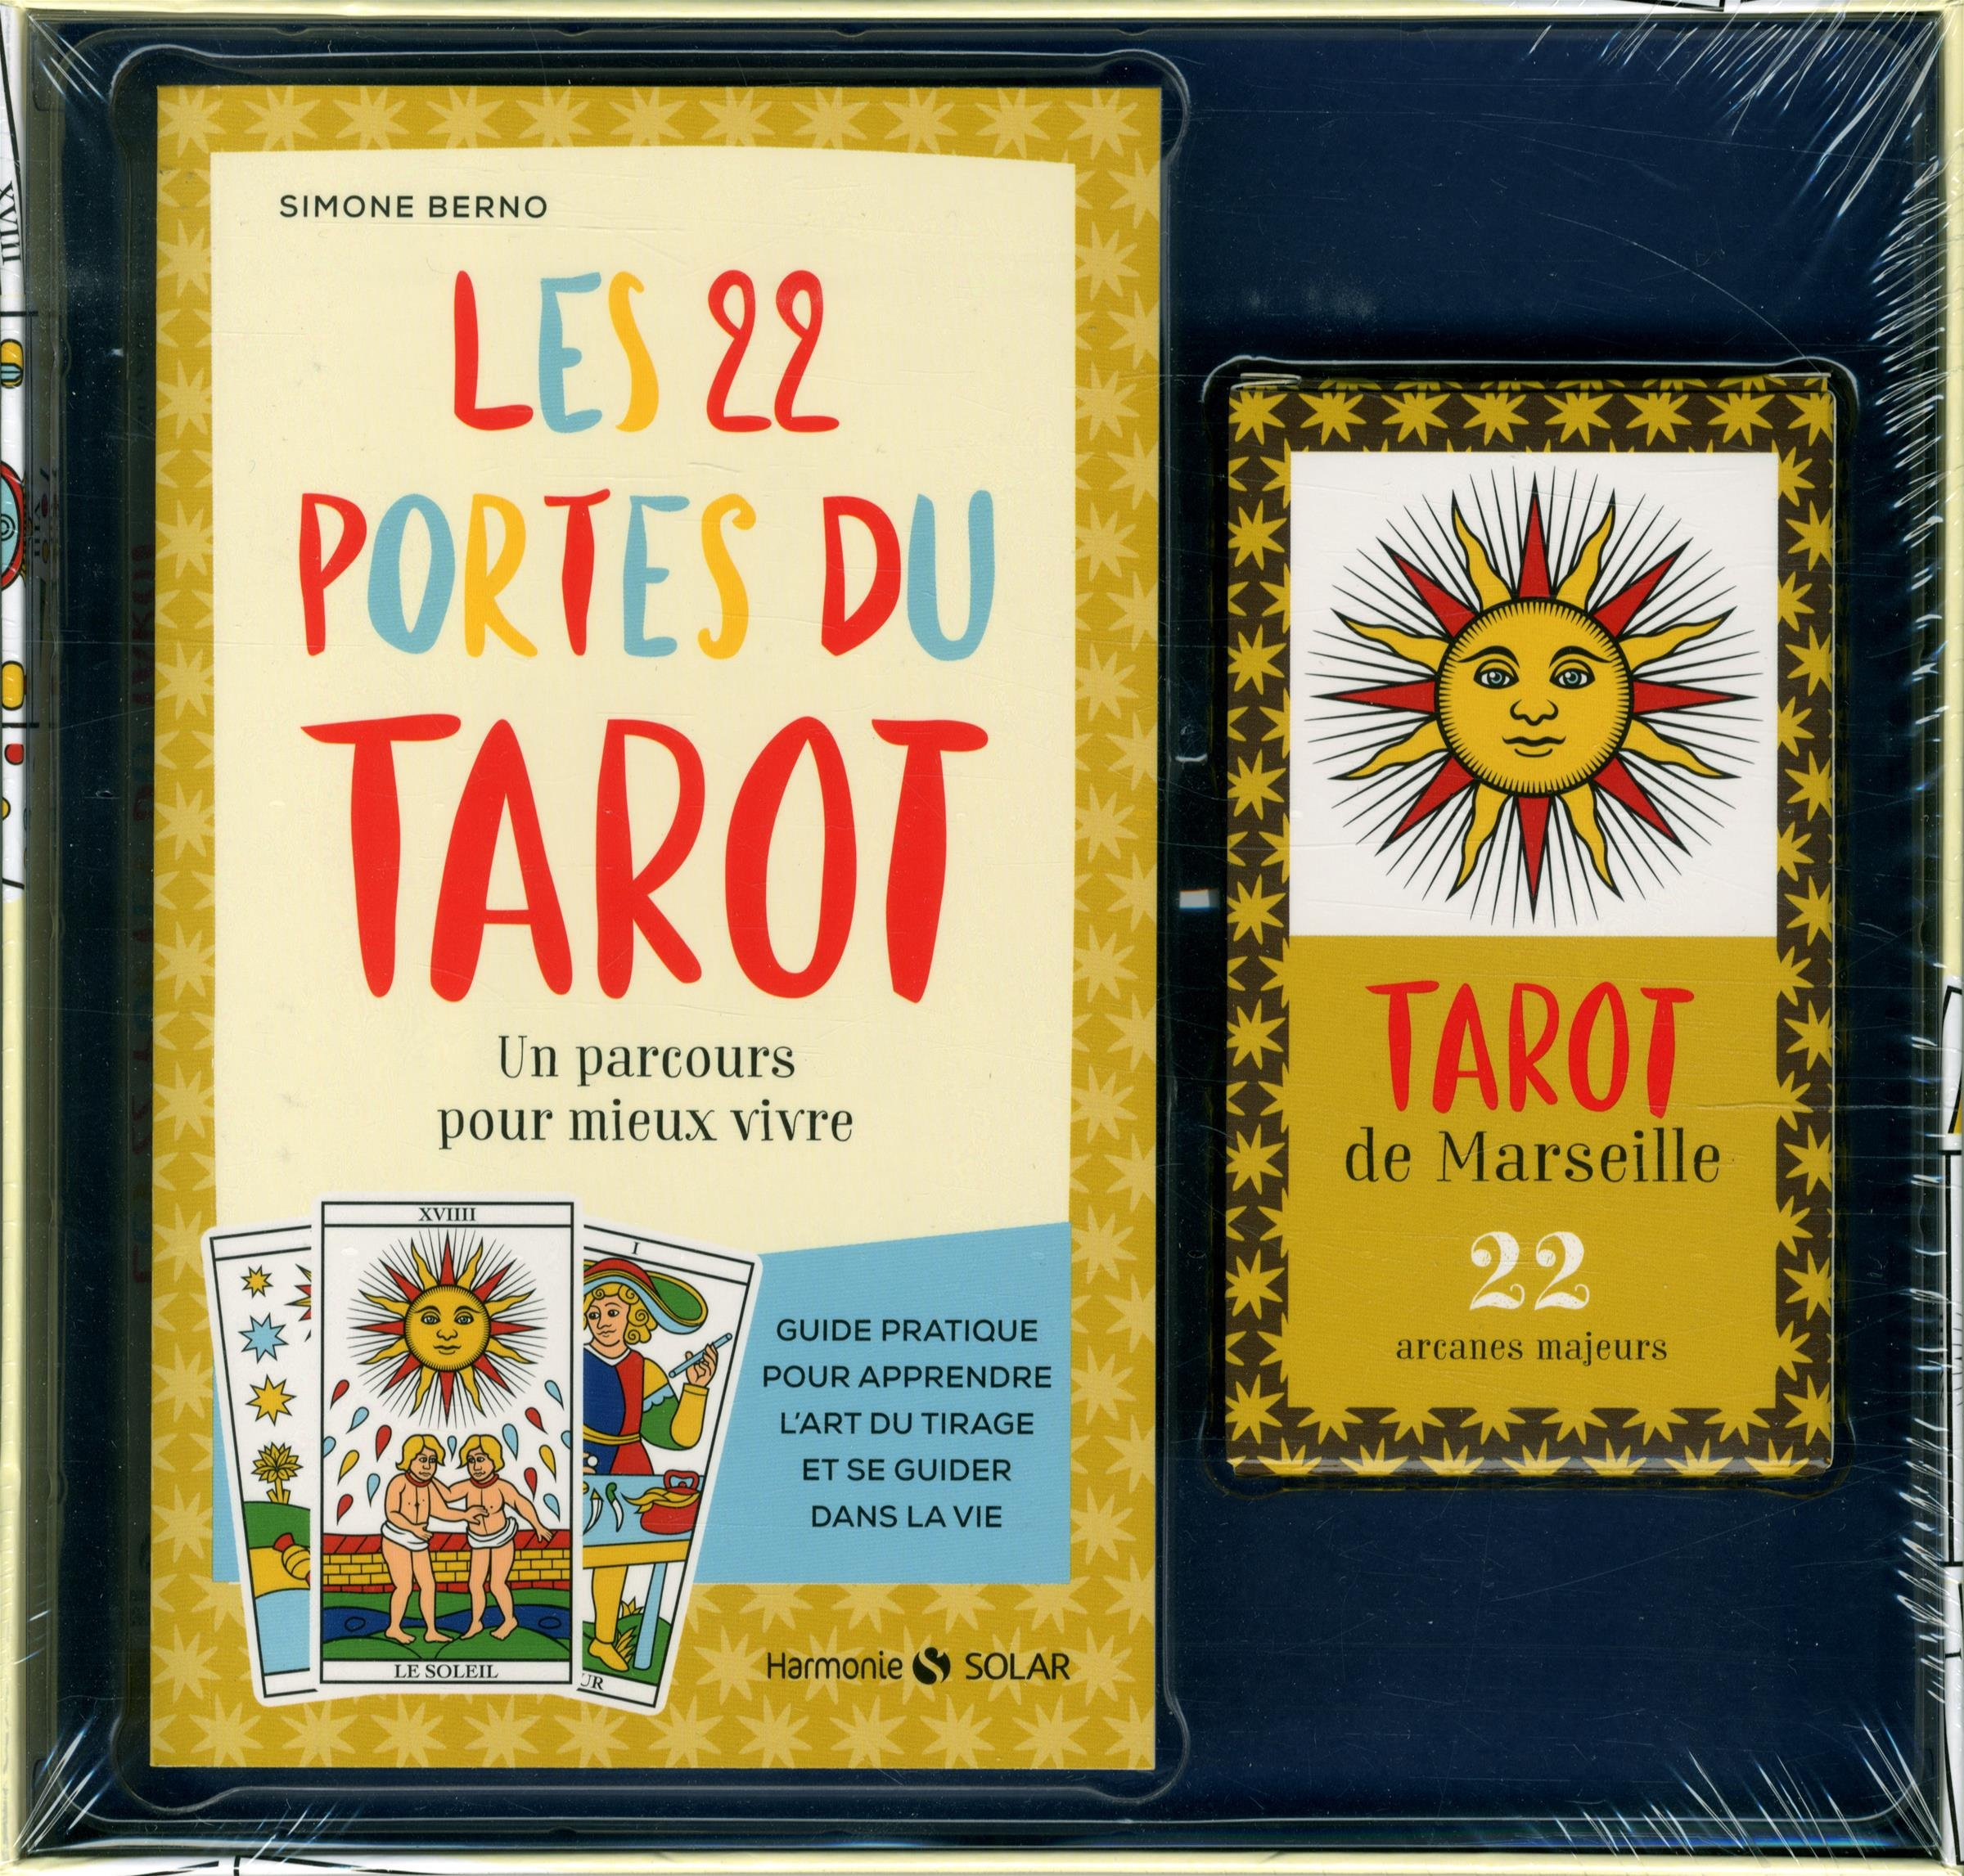 Amazon.fr - Les 22 portes du tarot - coffret - Simone BERNO - Livres 721c4156aedf